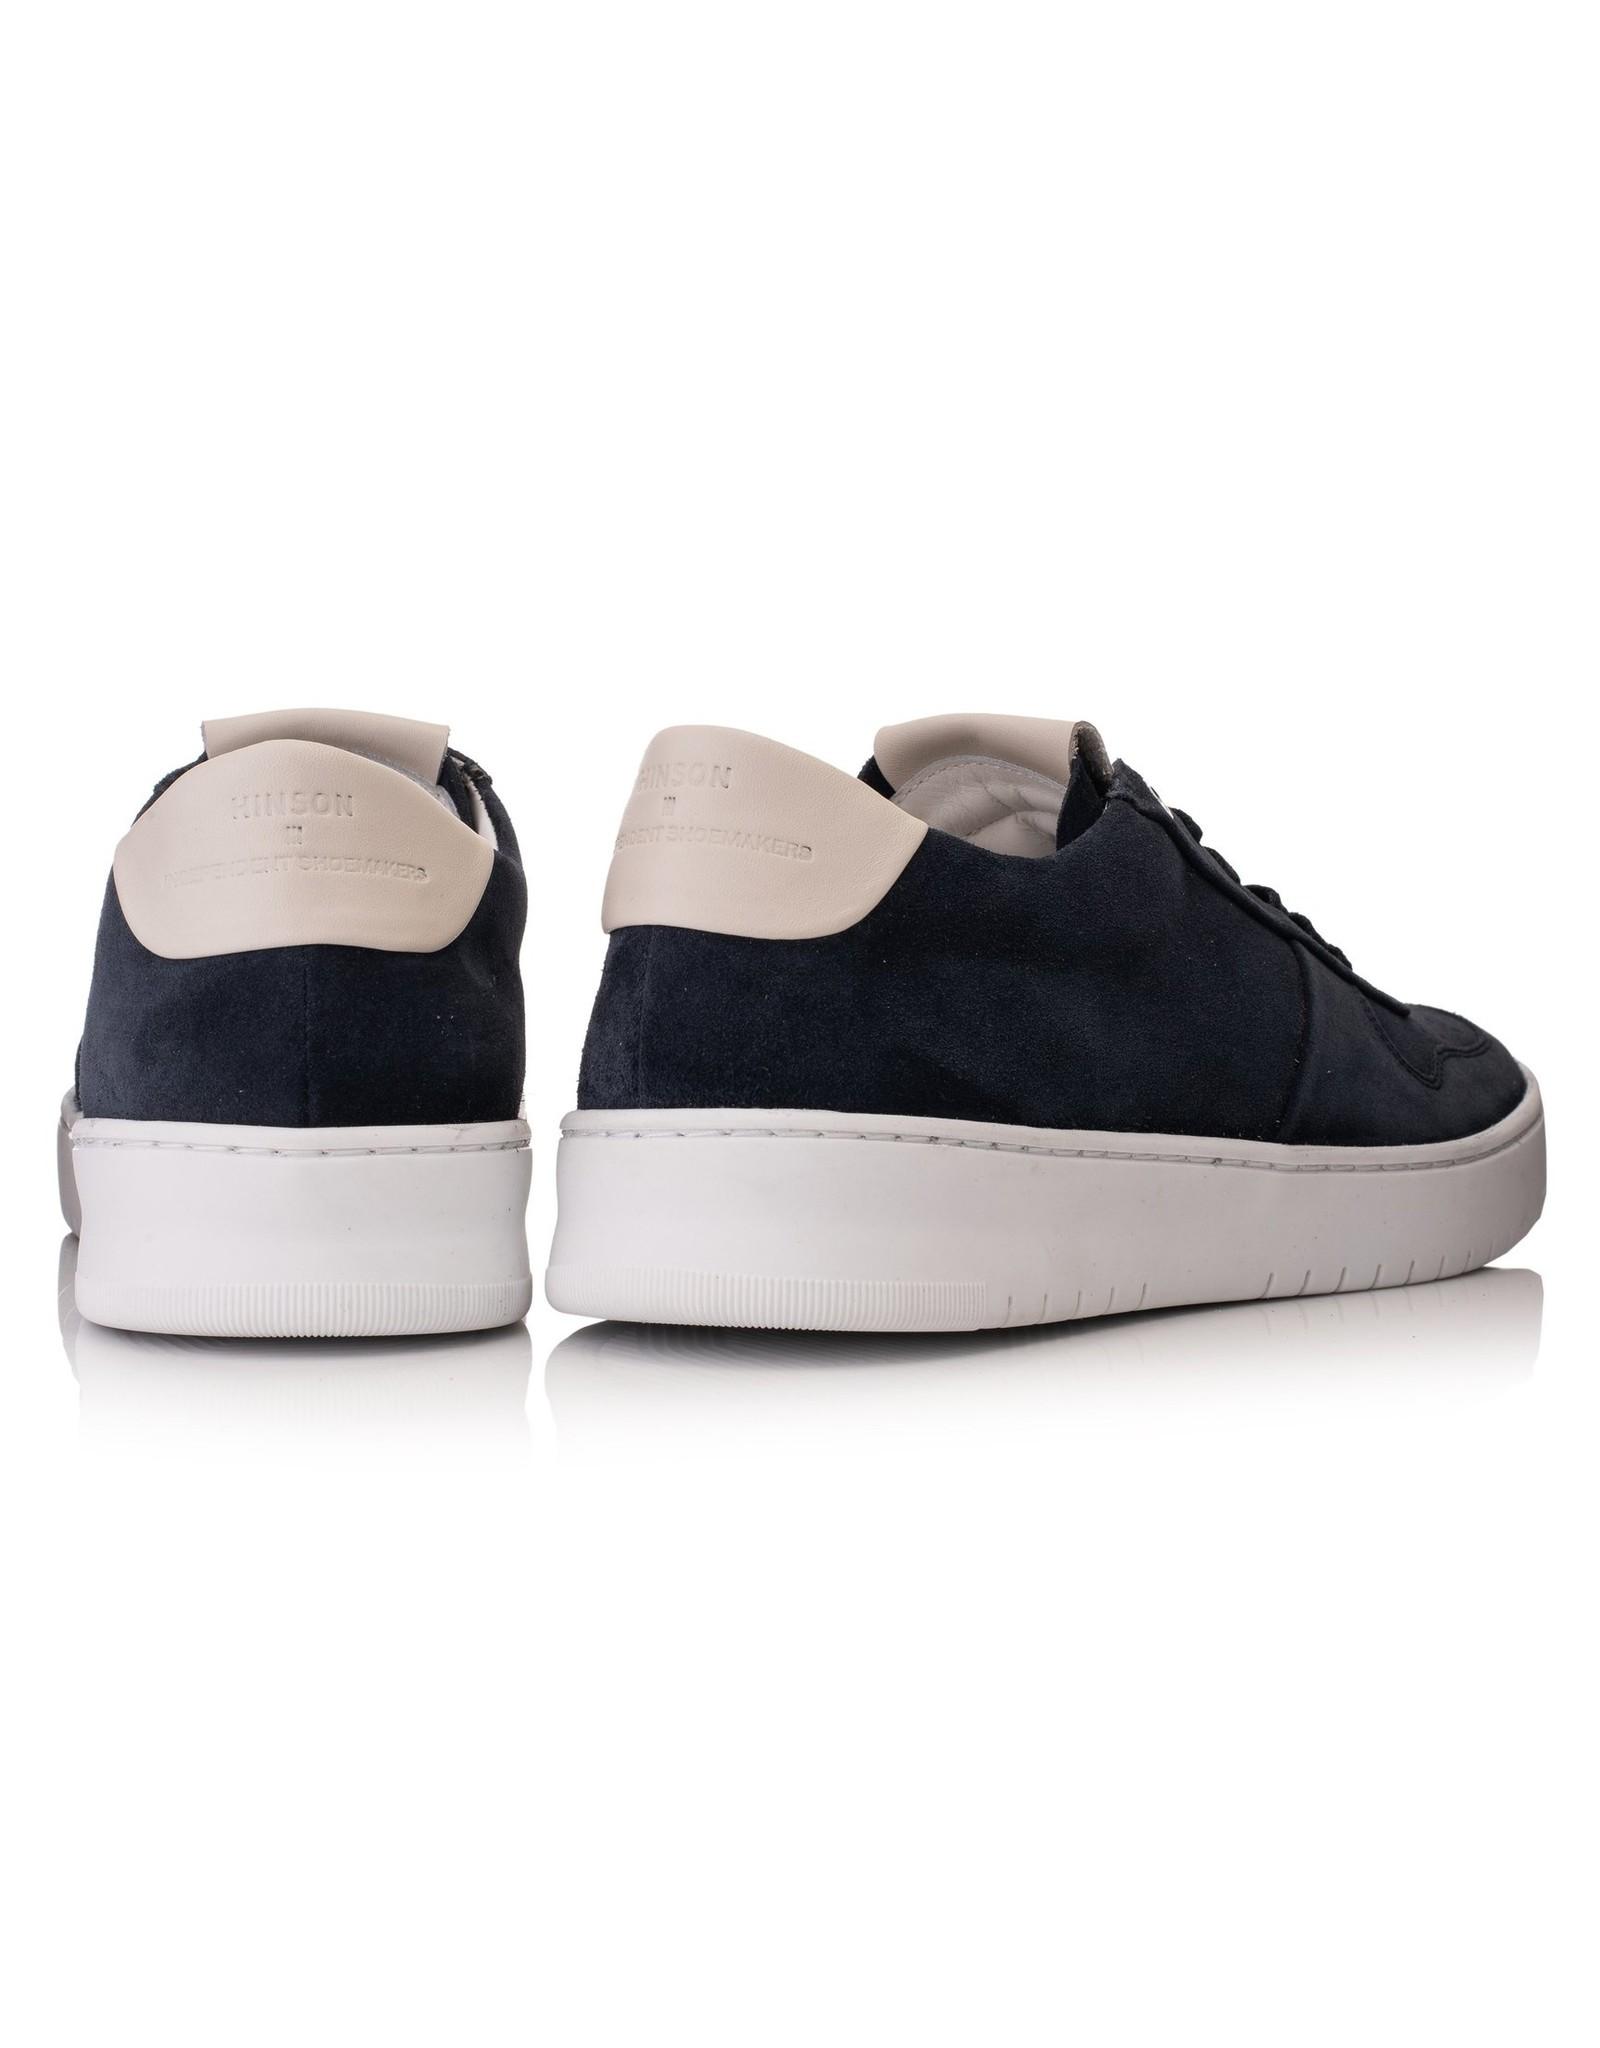 Hinson Sneaker blauw suede-zool suede